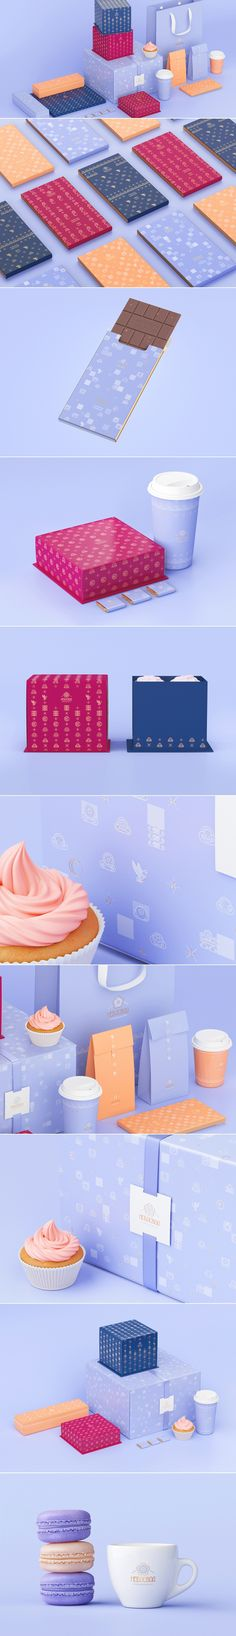 Nebosvod — The Dieline   Packaging & Branding Design & Innovation News